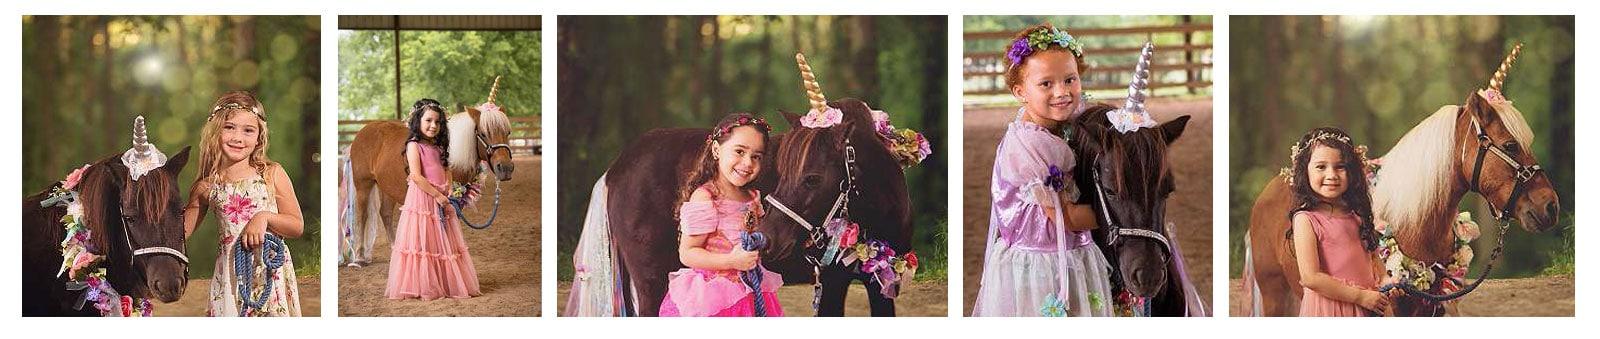 Unicorn Photos at SIRE